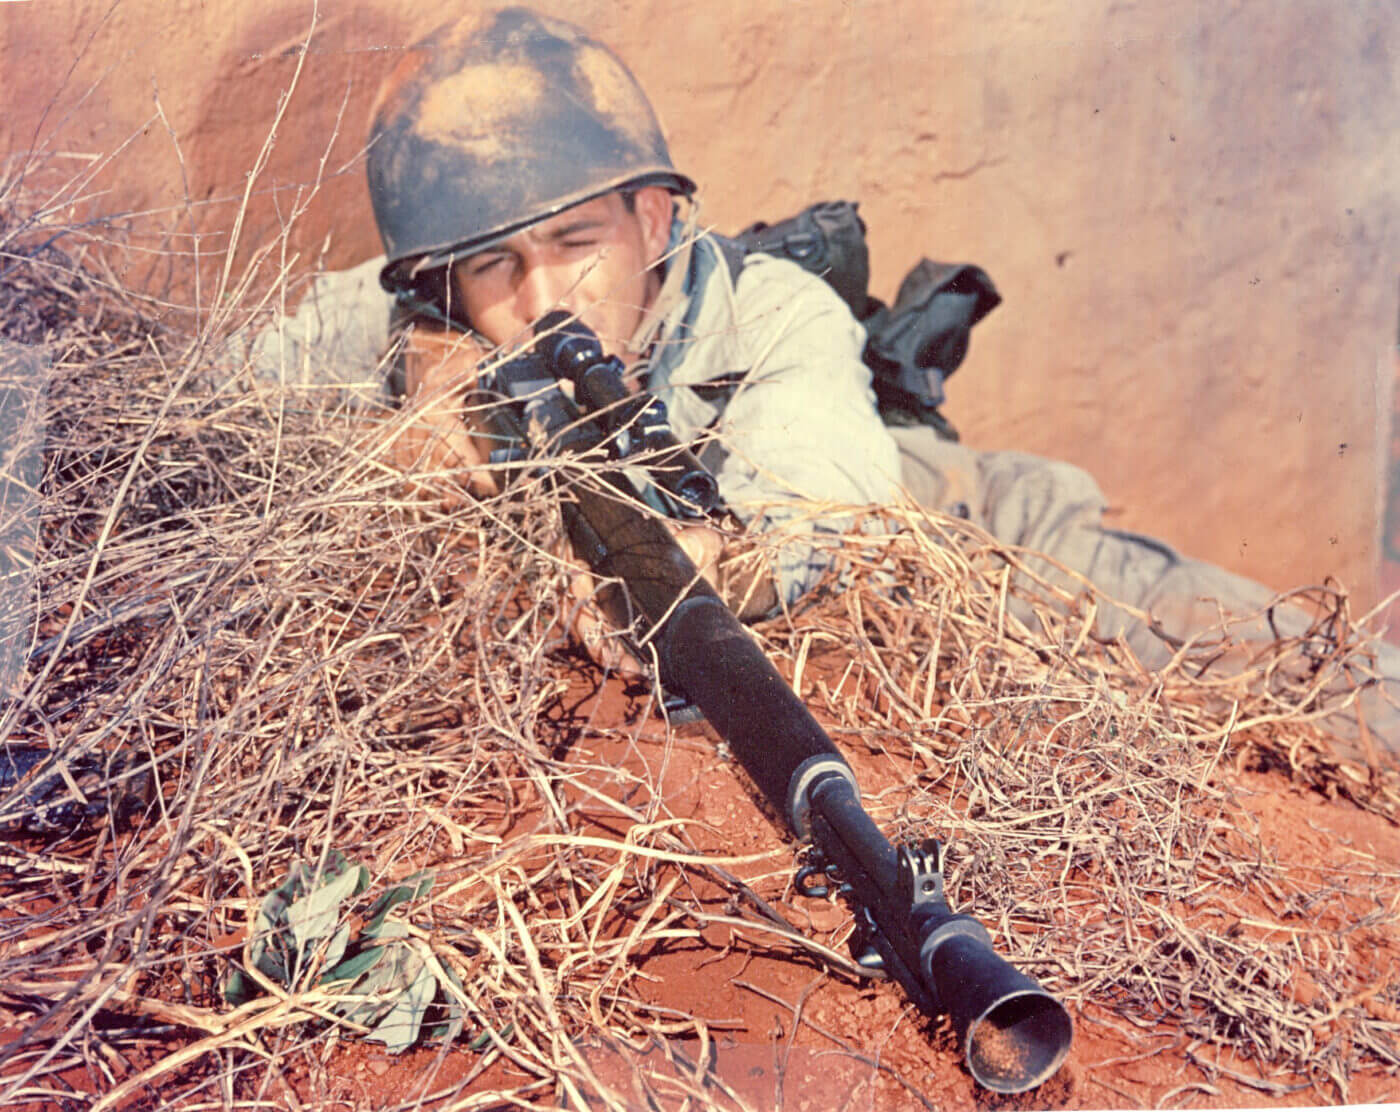 M1C sniper rifle in WWII